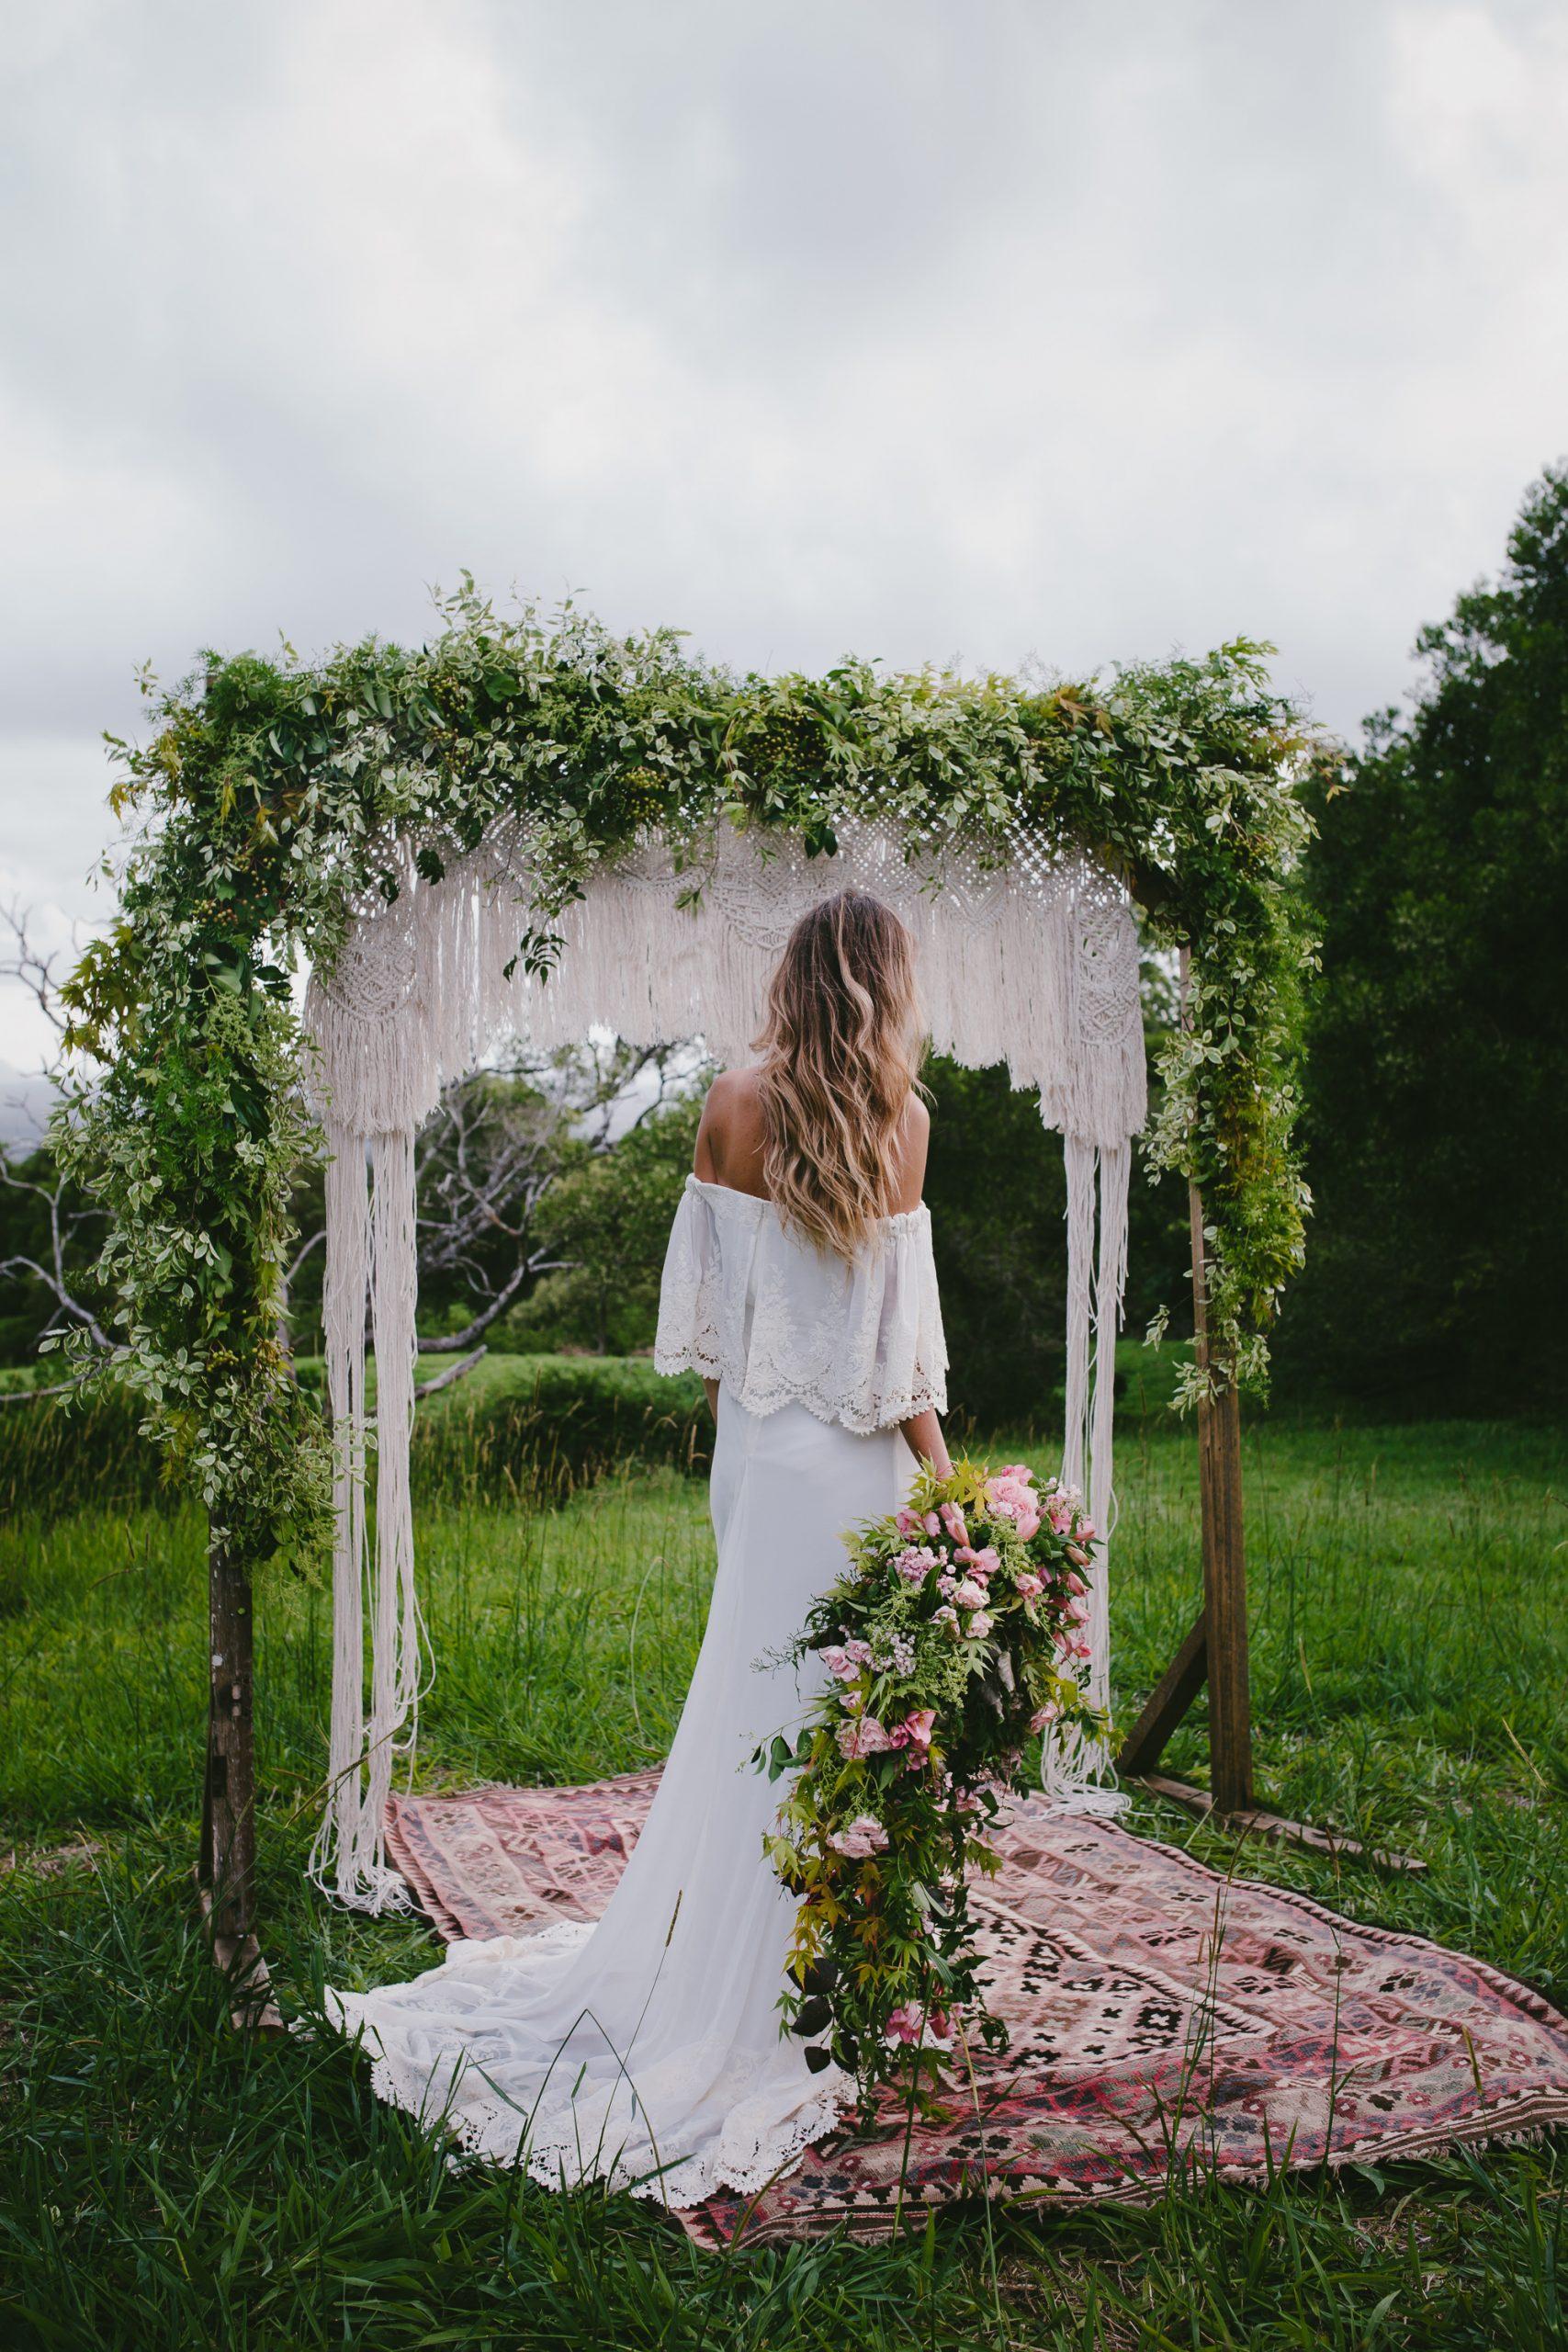 gold coast bridal wear, boho wedding dresses, gold coast wedding dresses, bohemian wedding dress, gold coast tipis, sphere collective